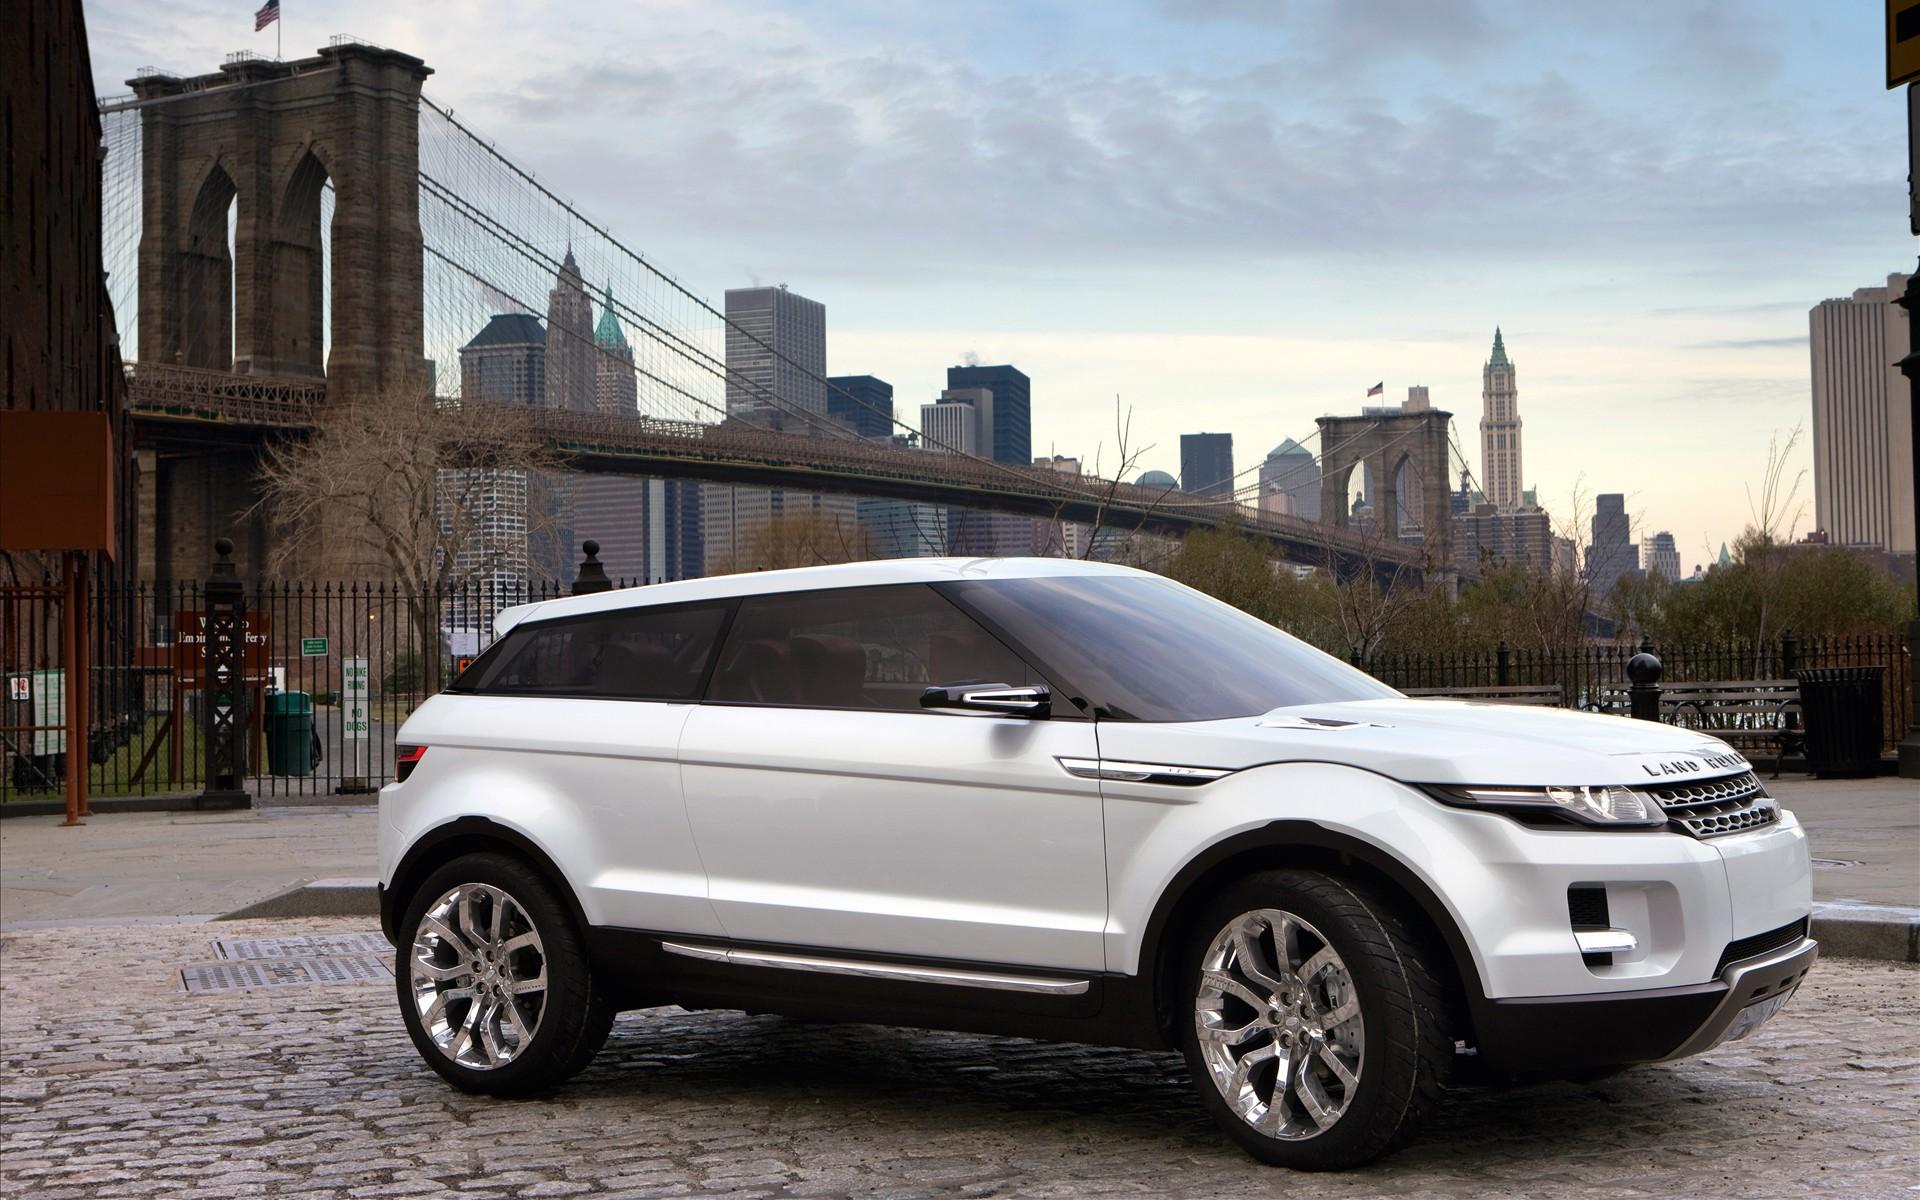 Land Rover Sport >> 新款路虎越野车高清图片素材专辑1(20P)[中国PhotoShop资源网|PS教程|PSD模板|照片处理|PS素材 ...